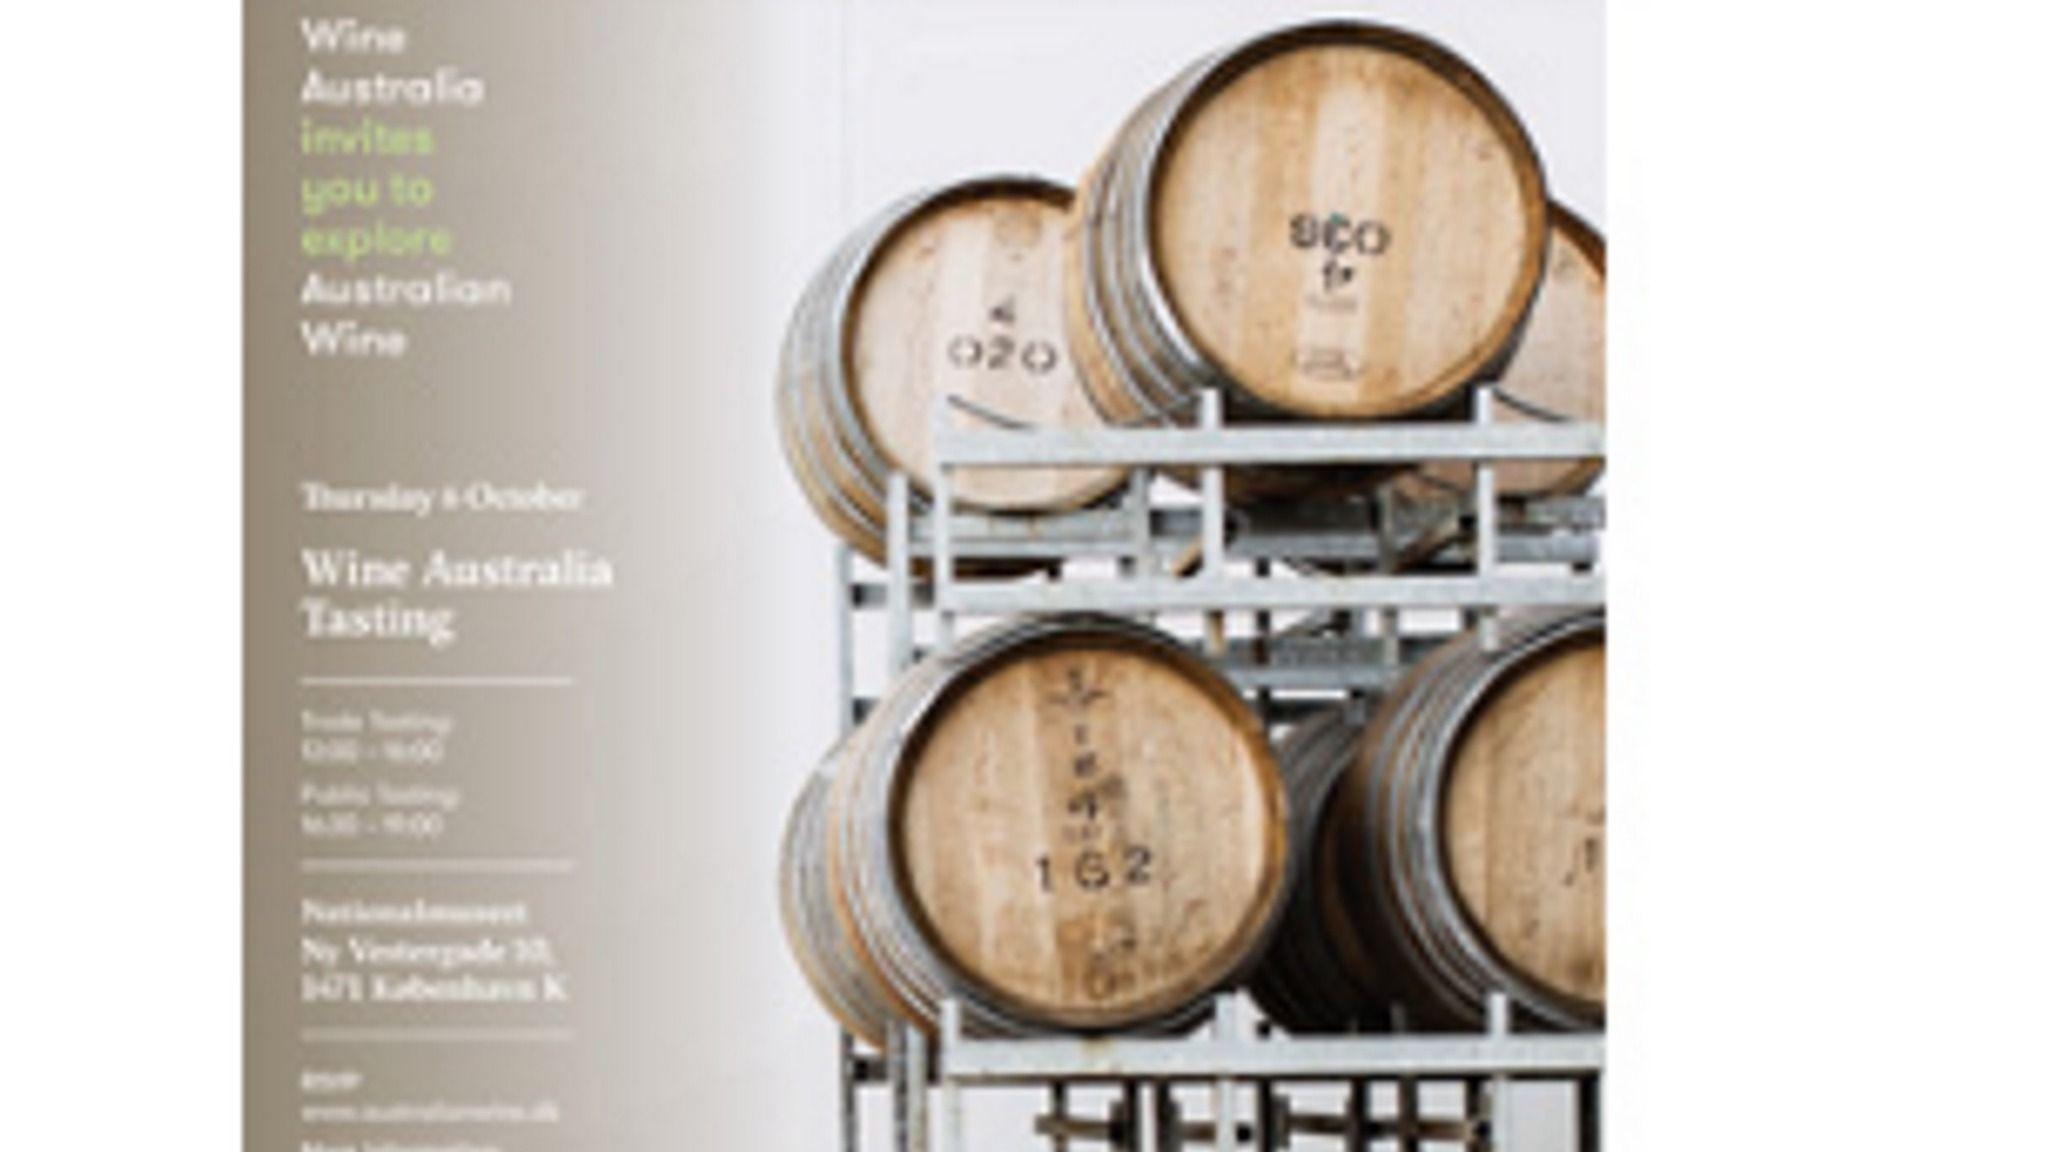 Australia Wine Day Stockholm